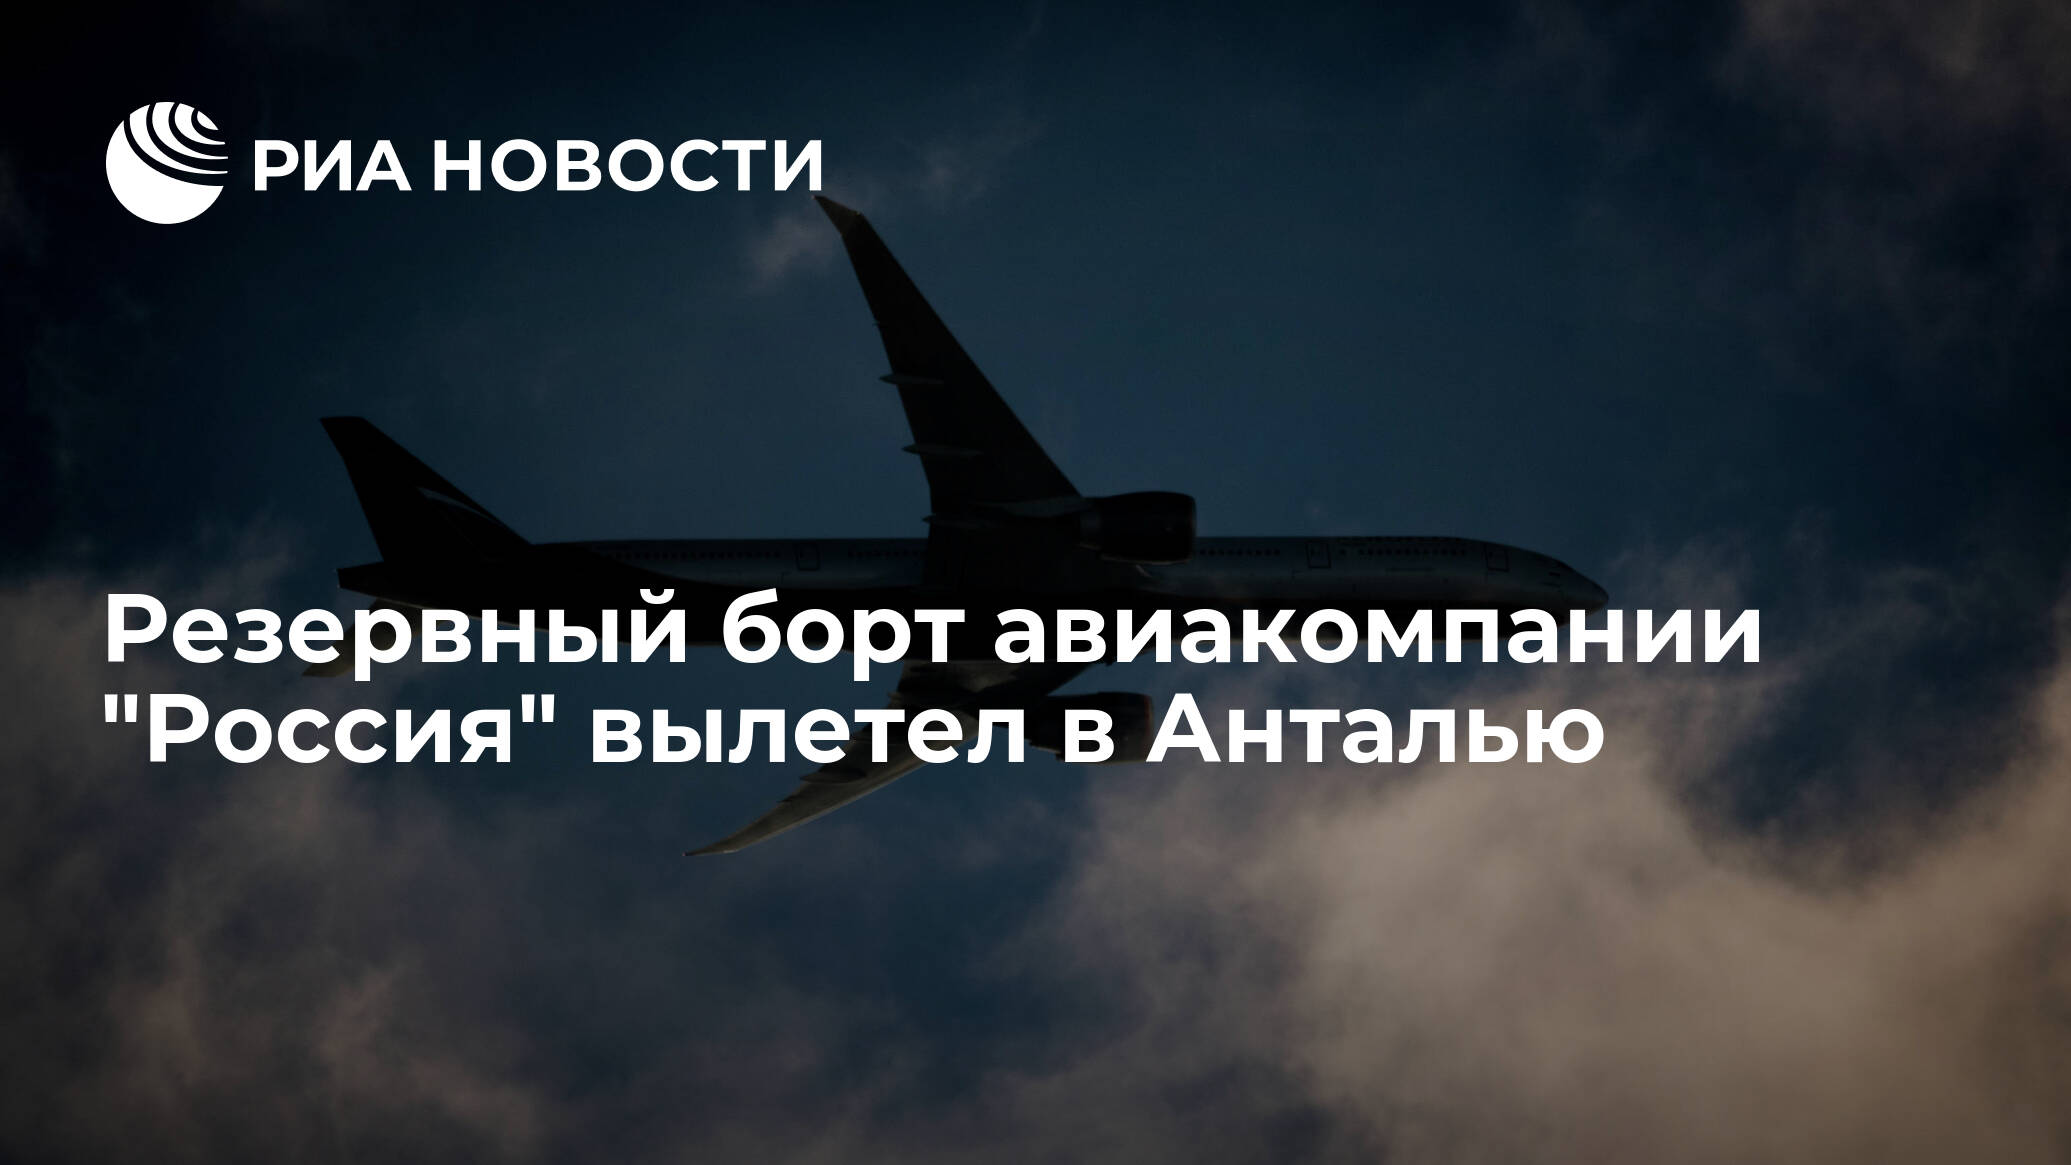 Резервный борт авиакомпании